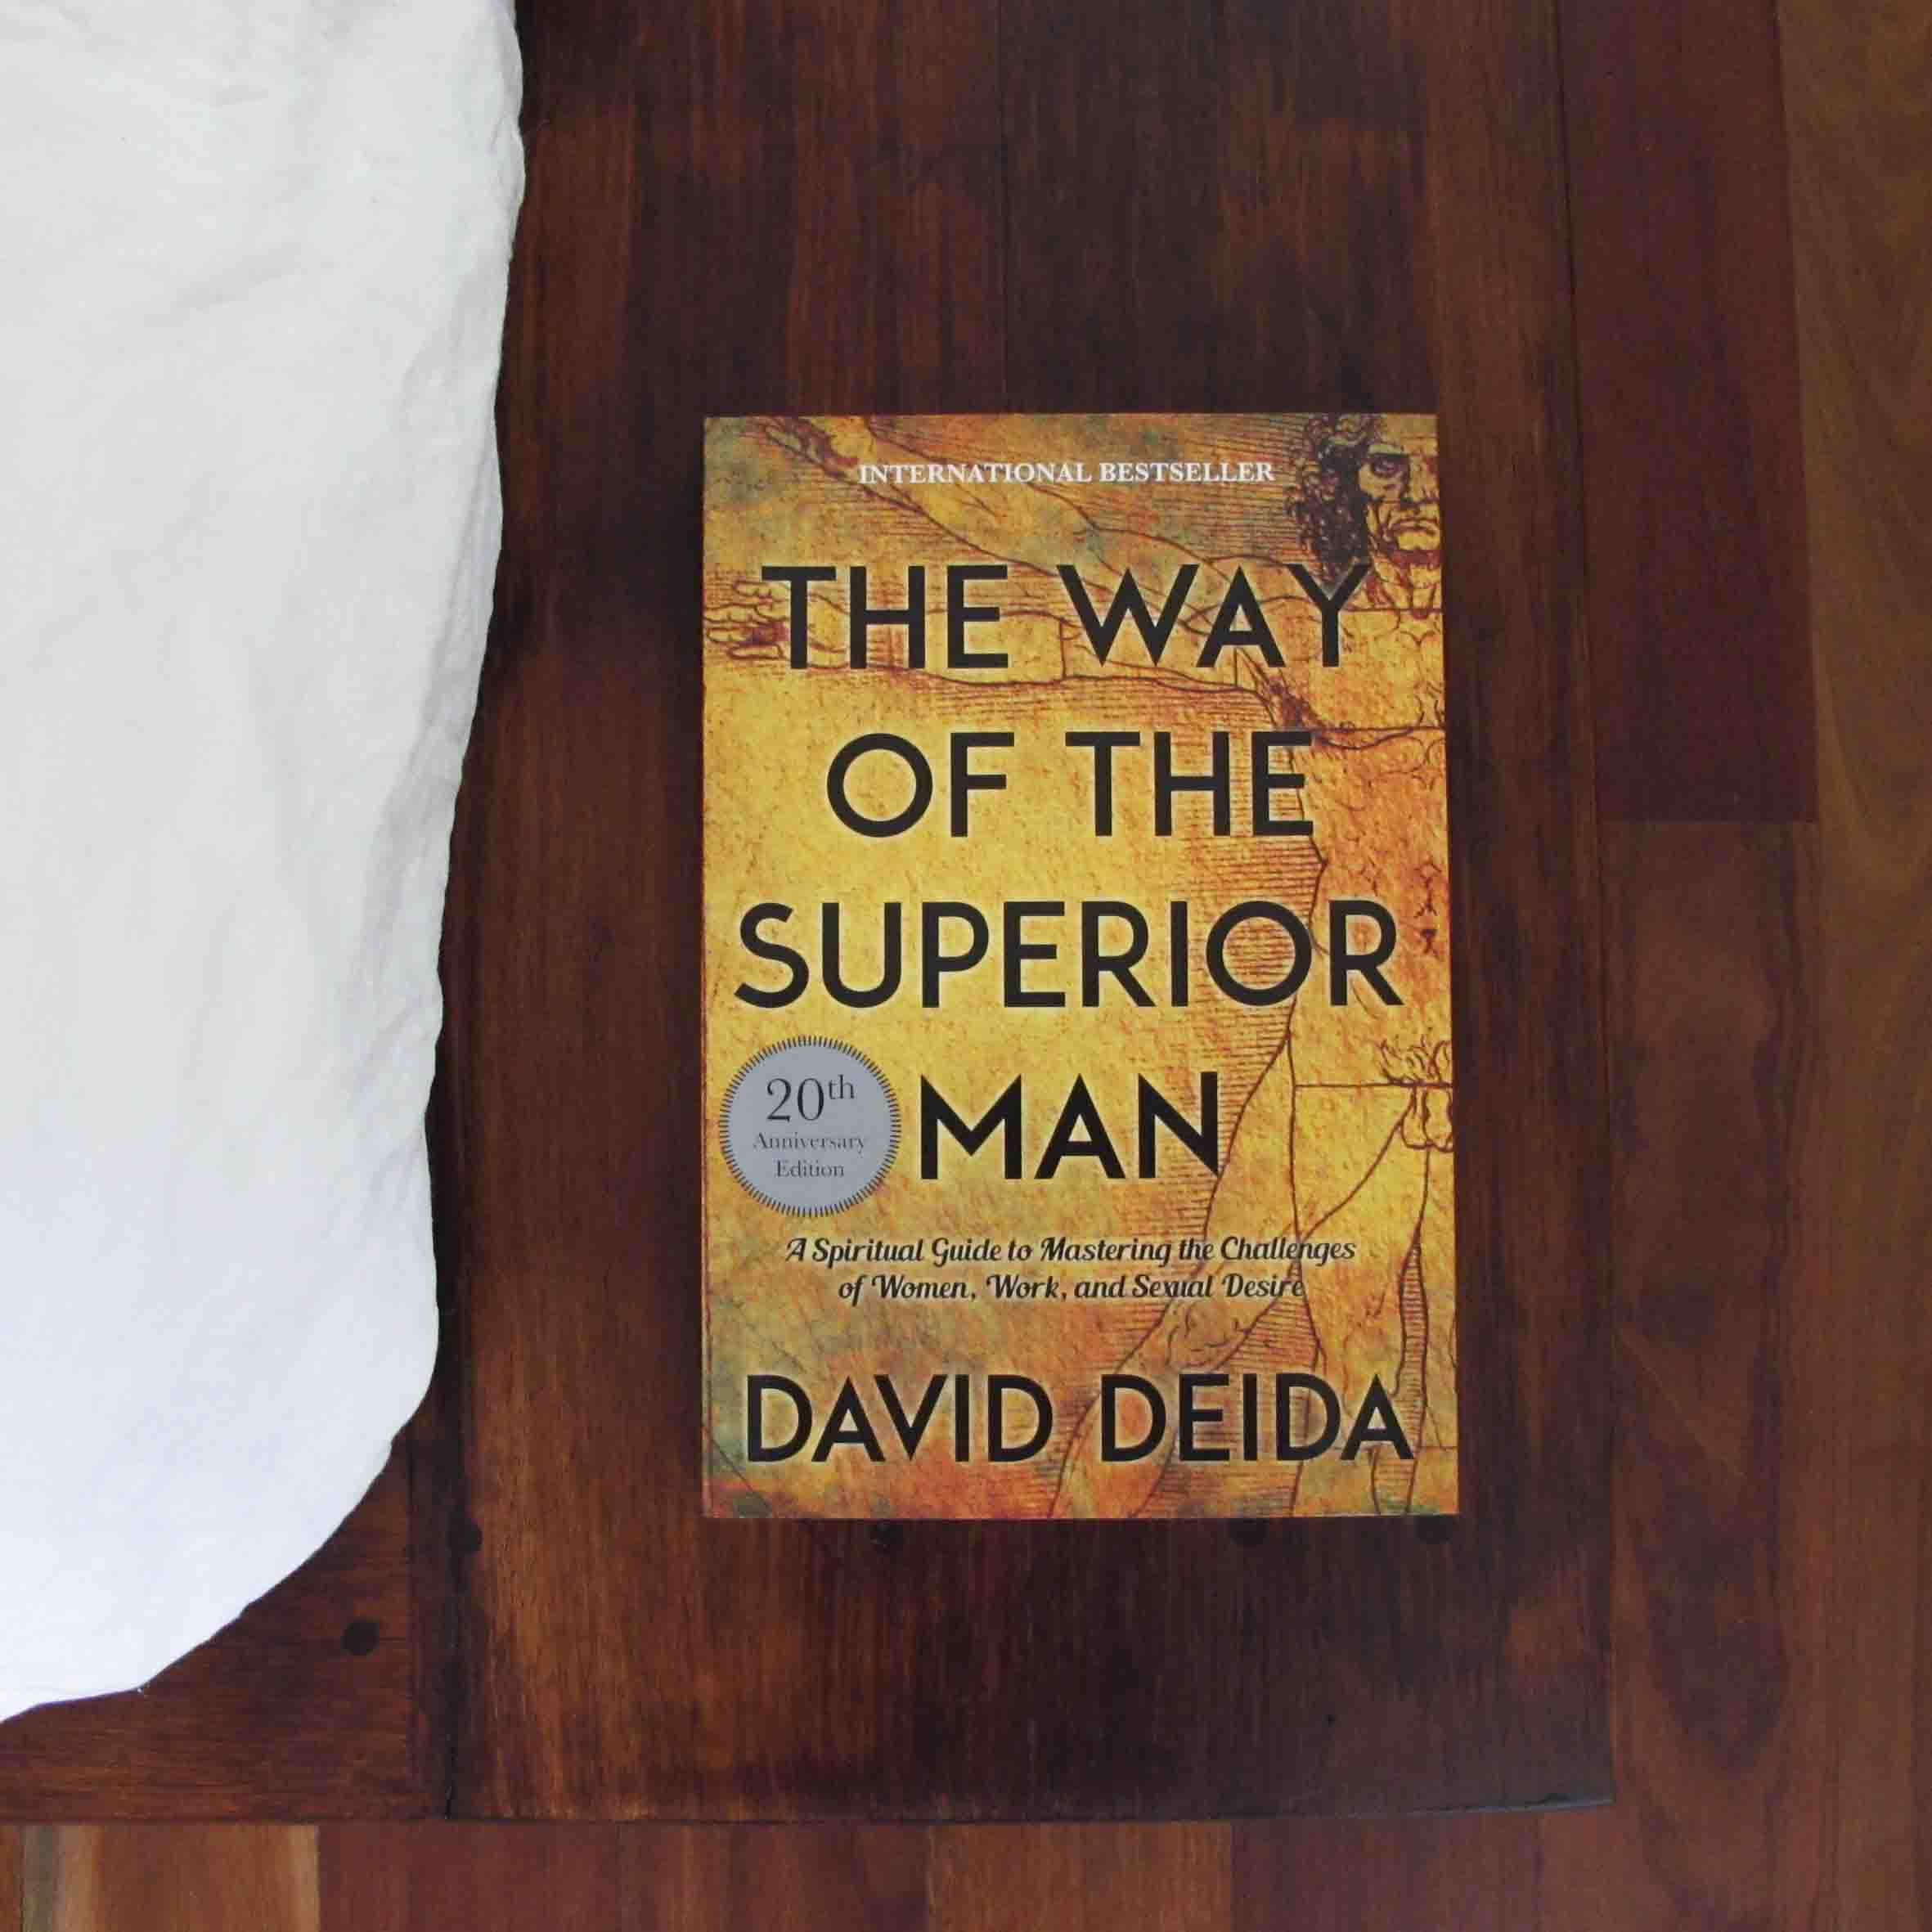 Deida, D 2004, The Way of the Superior Man